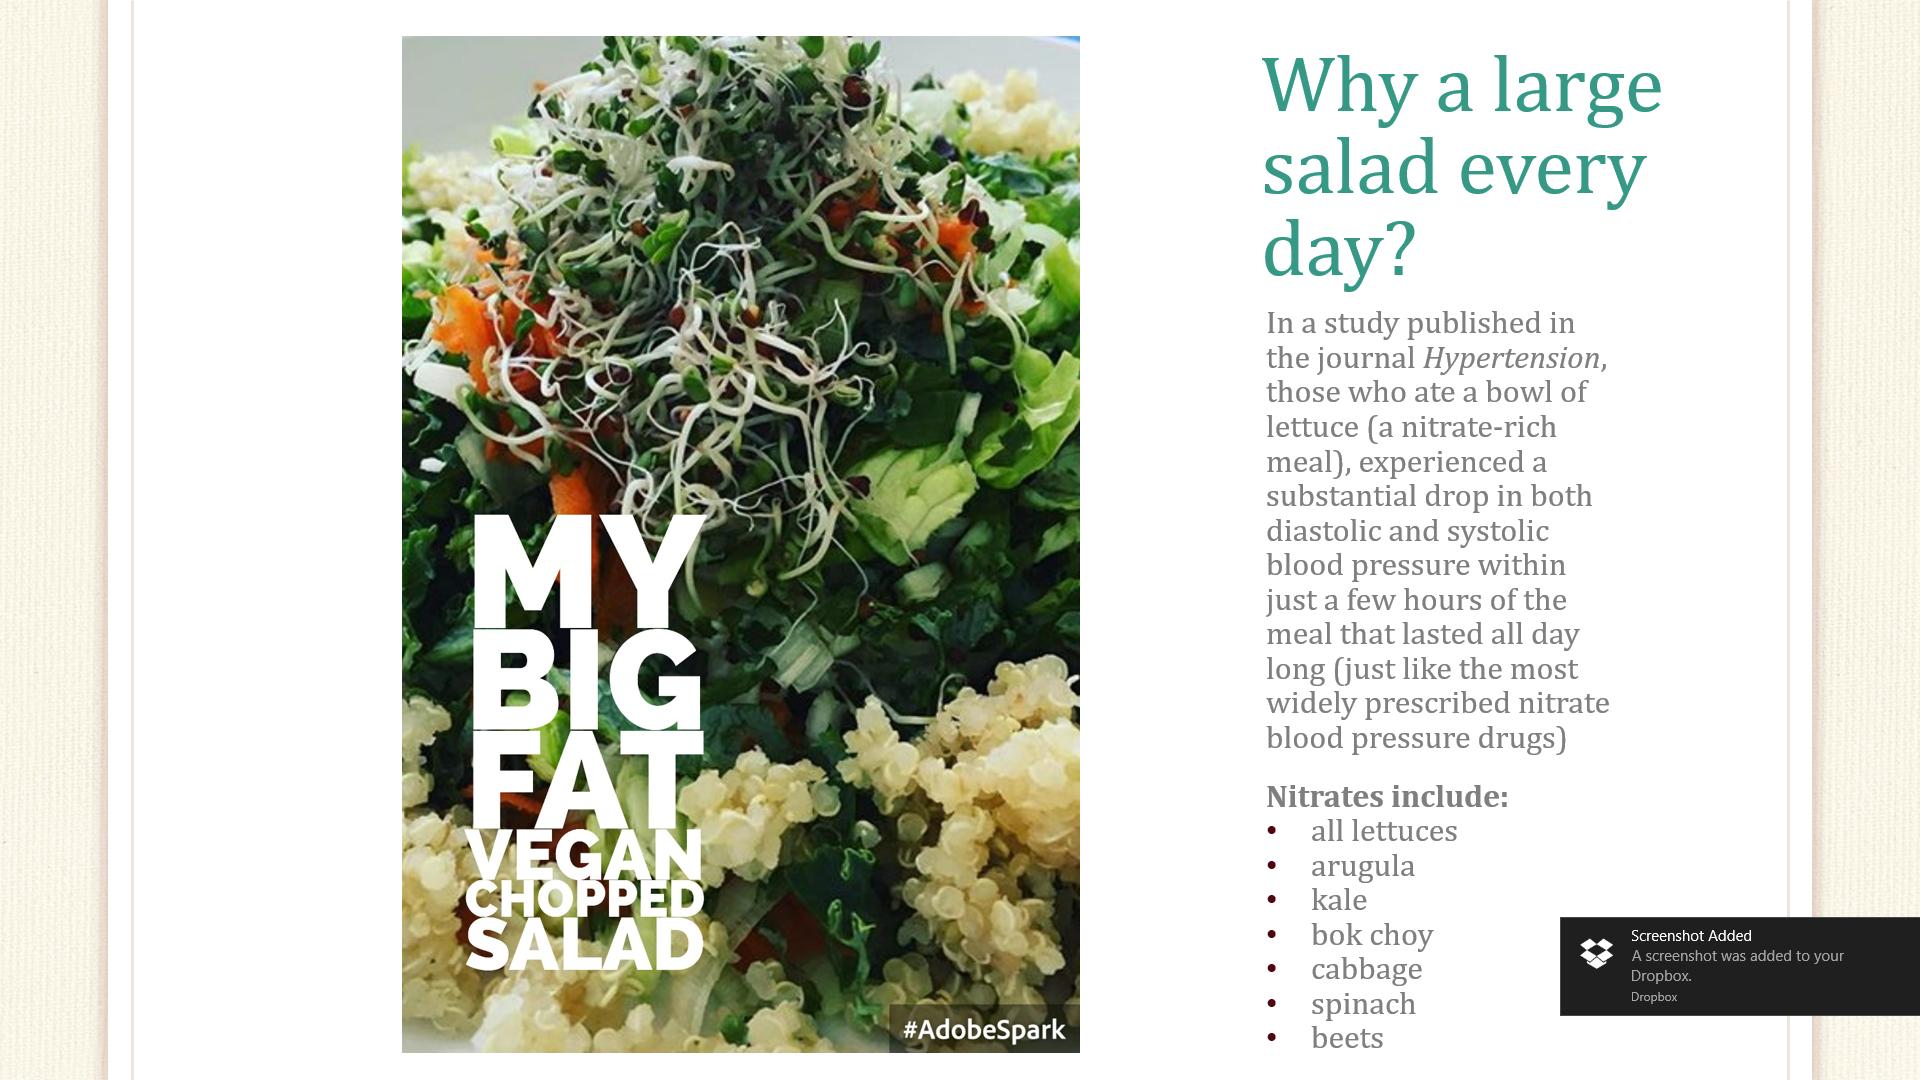 Big Chopped Green Salad